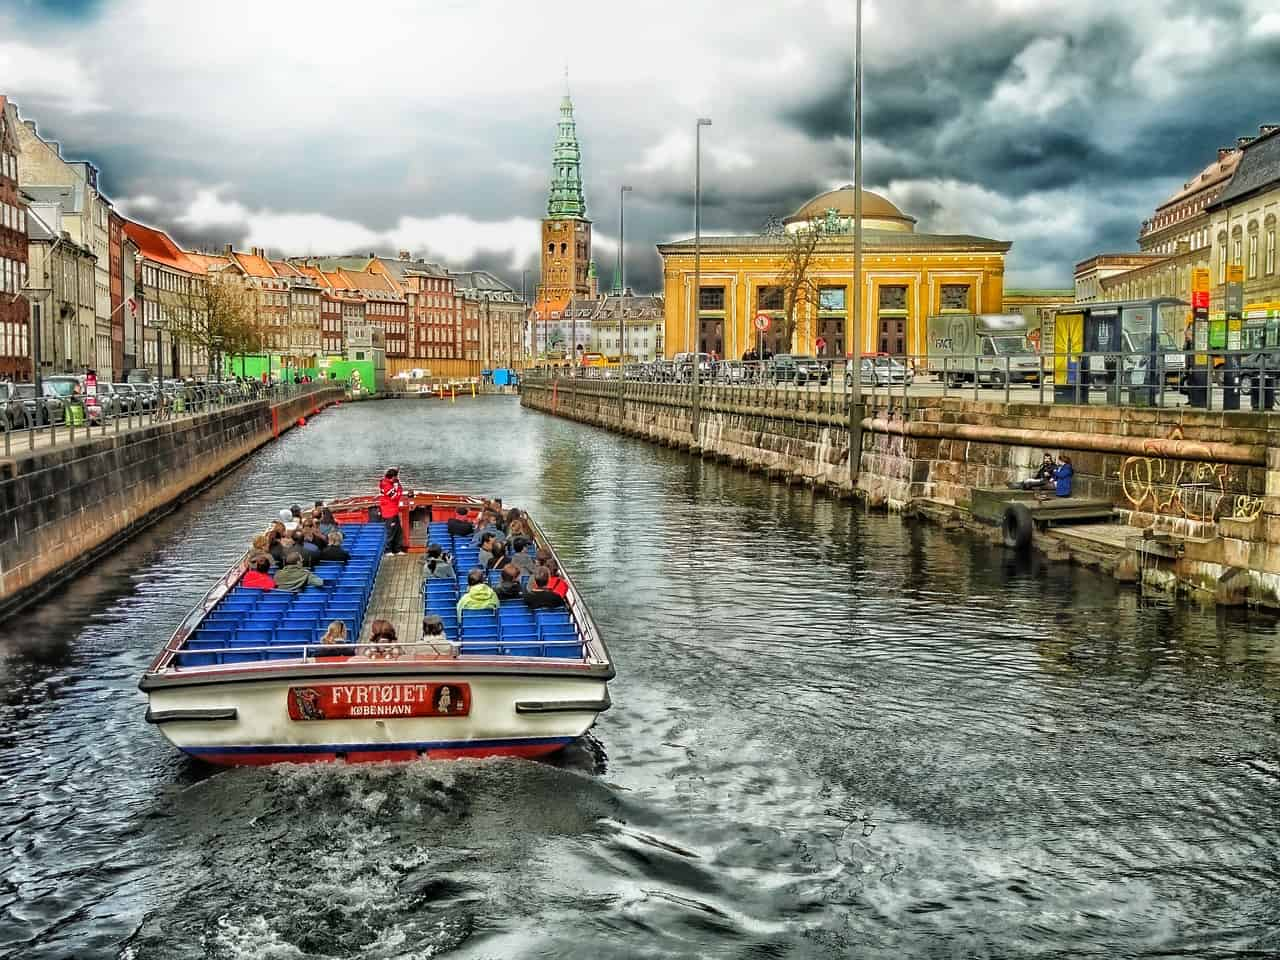 Dänemark Urlaub - ab 17,10€ Last Minute Flüge buchen 1